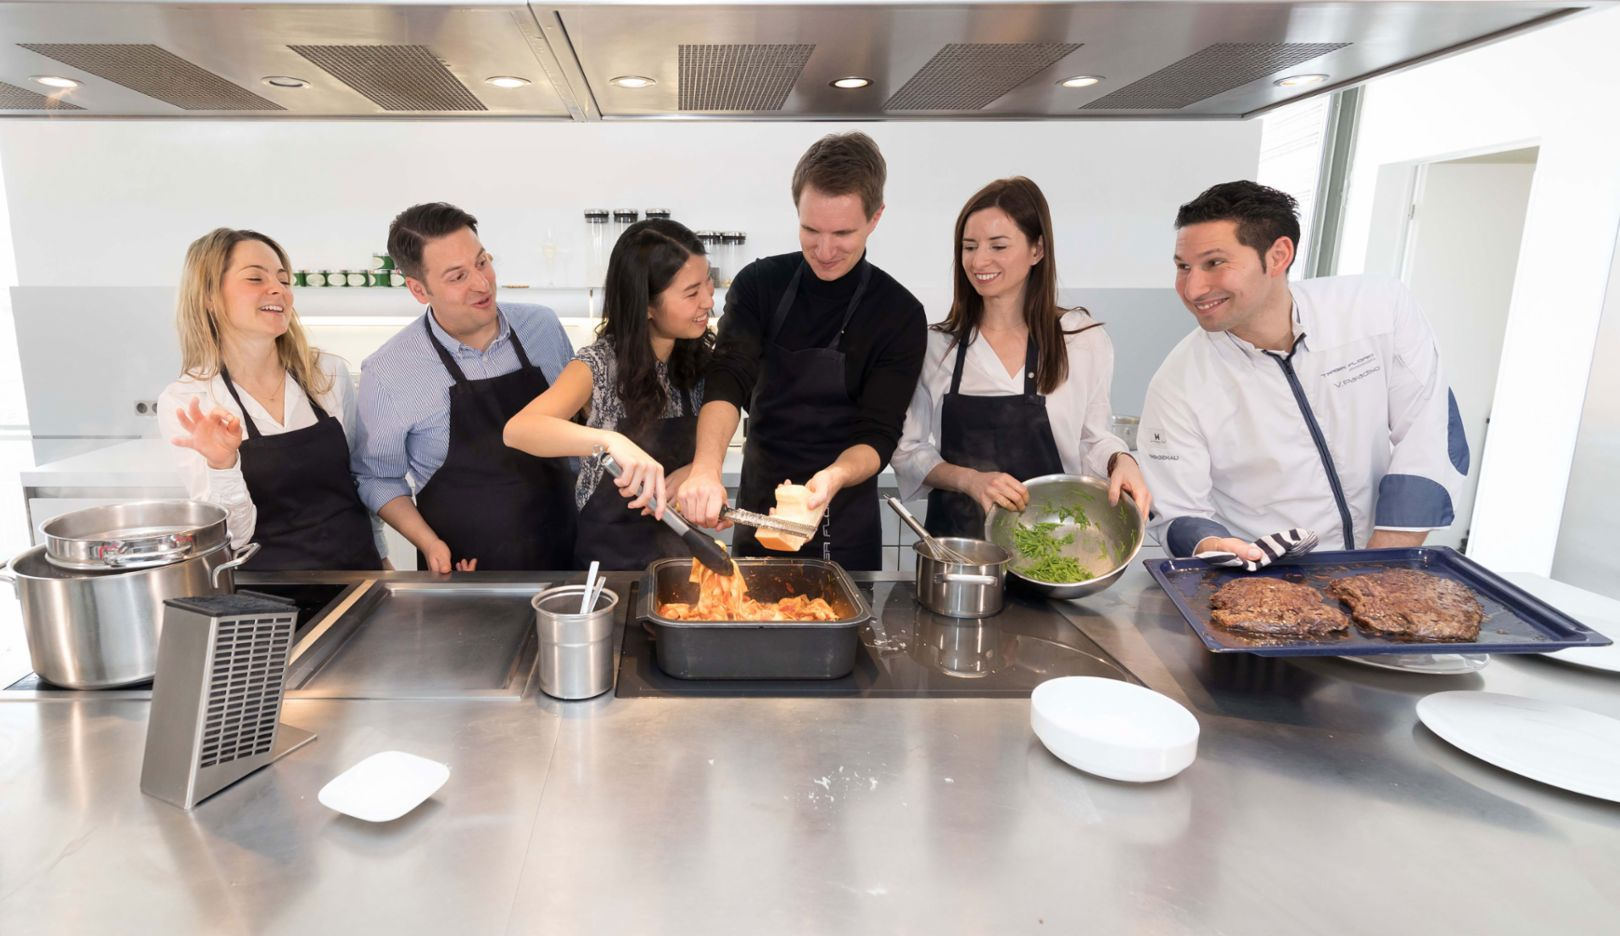 Cooking course, Böblingen, 2017, Porsche Consulting GmbH